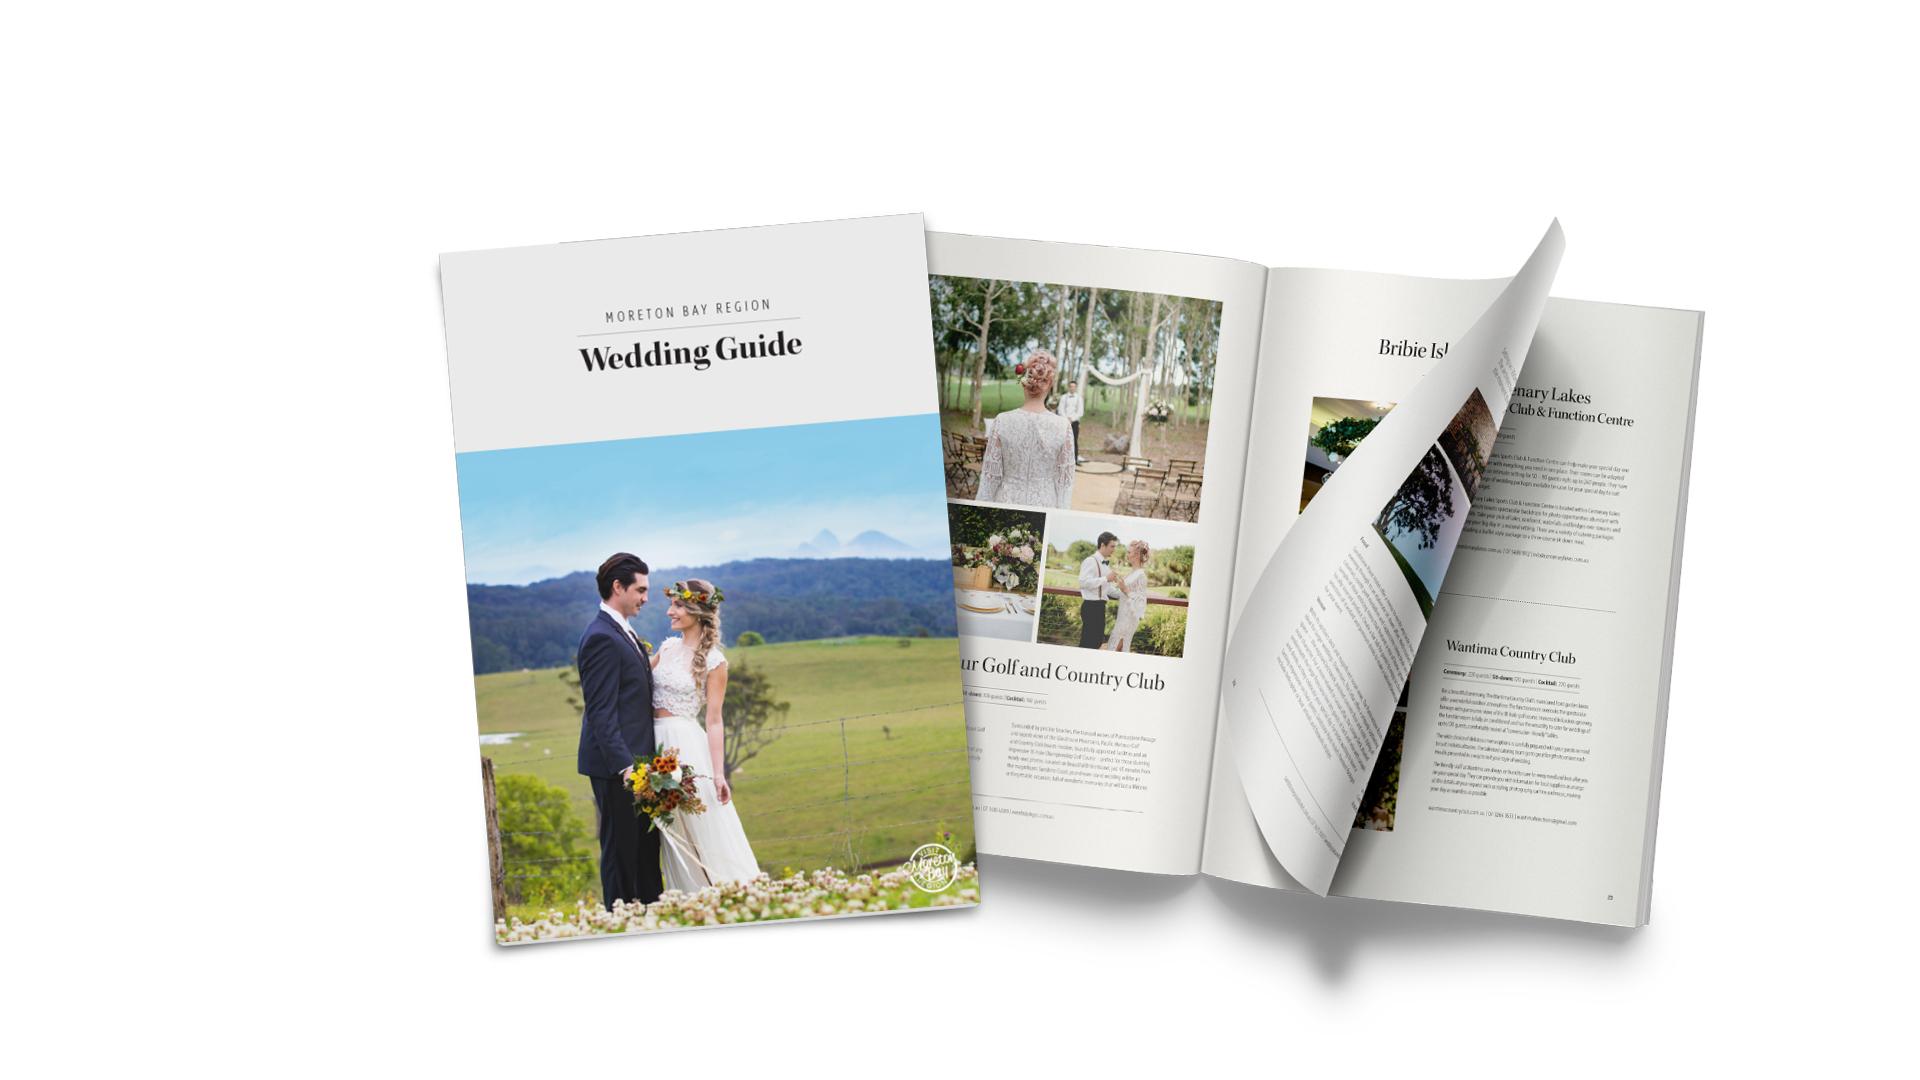 Moreton Bay Region Wedding Guide